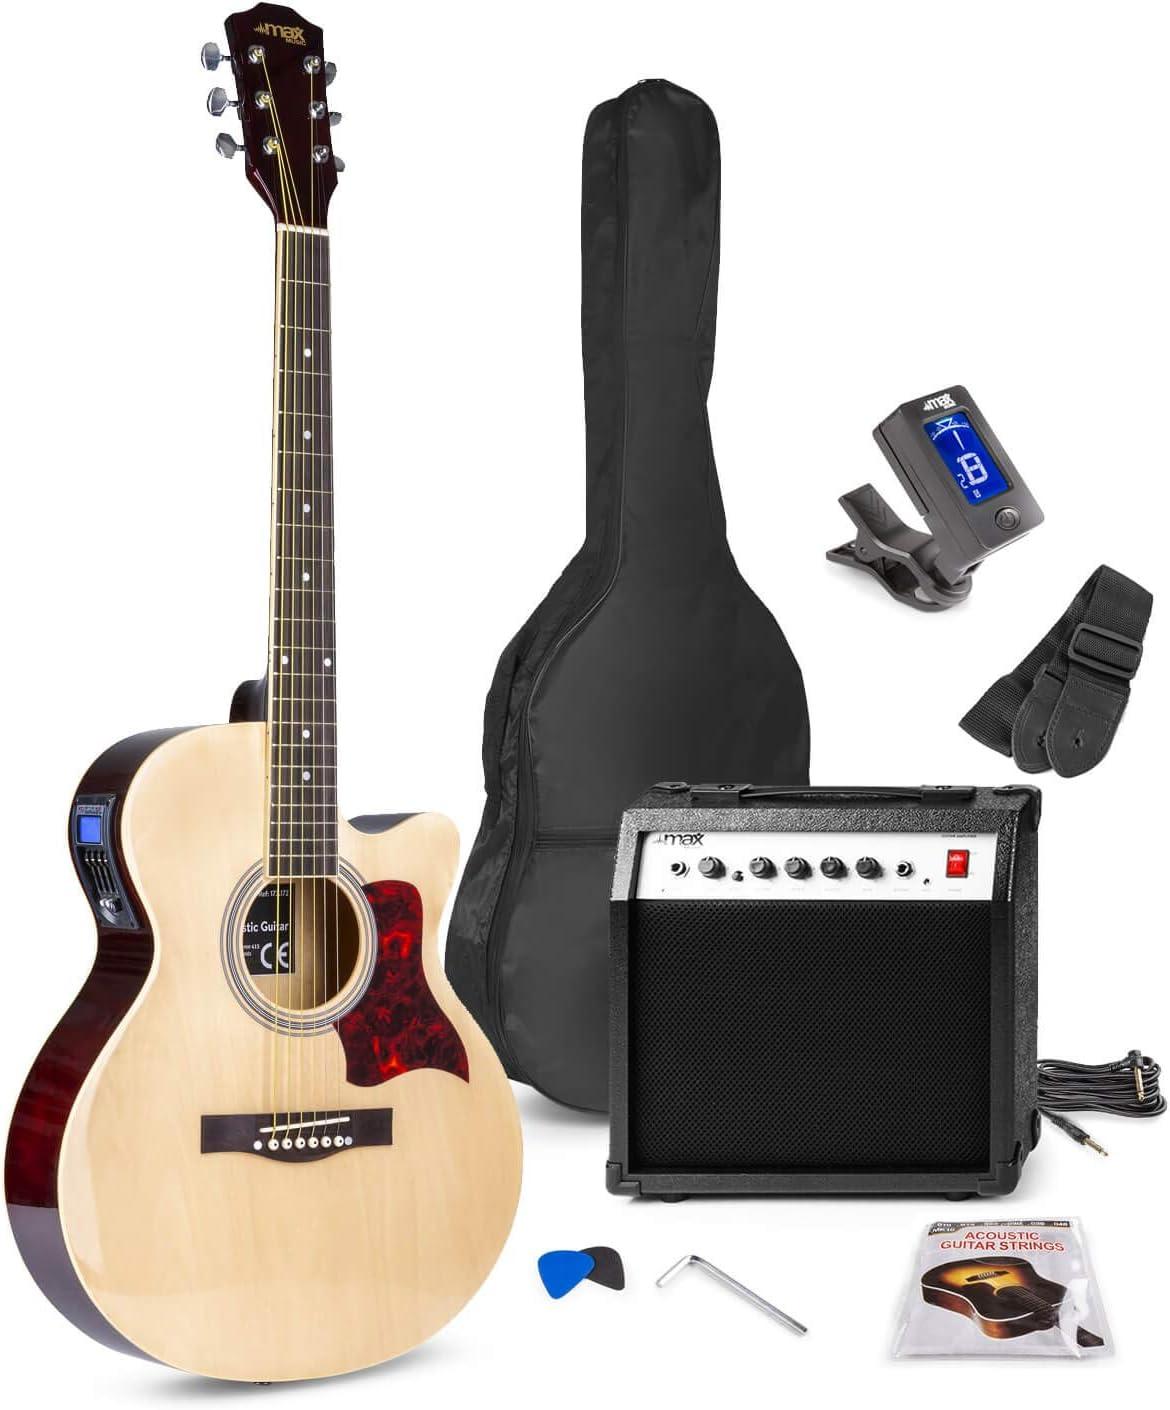 Maz Show, kit de guitarra electroacústica para principiantes.